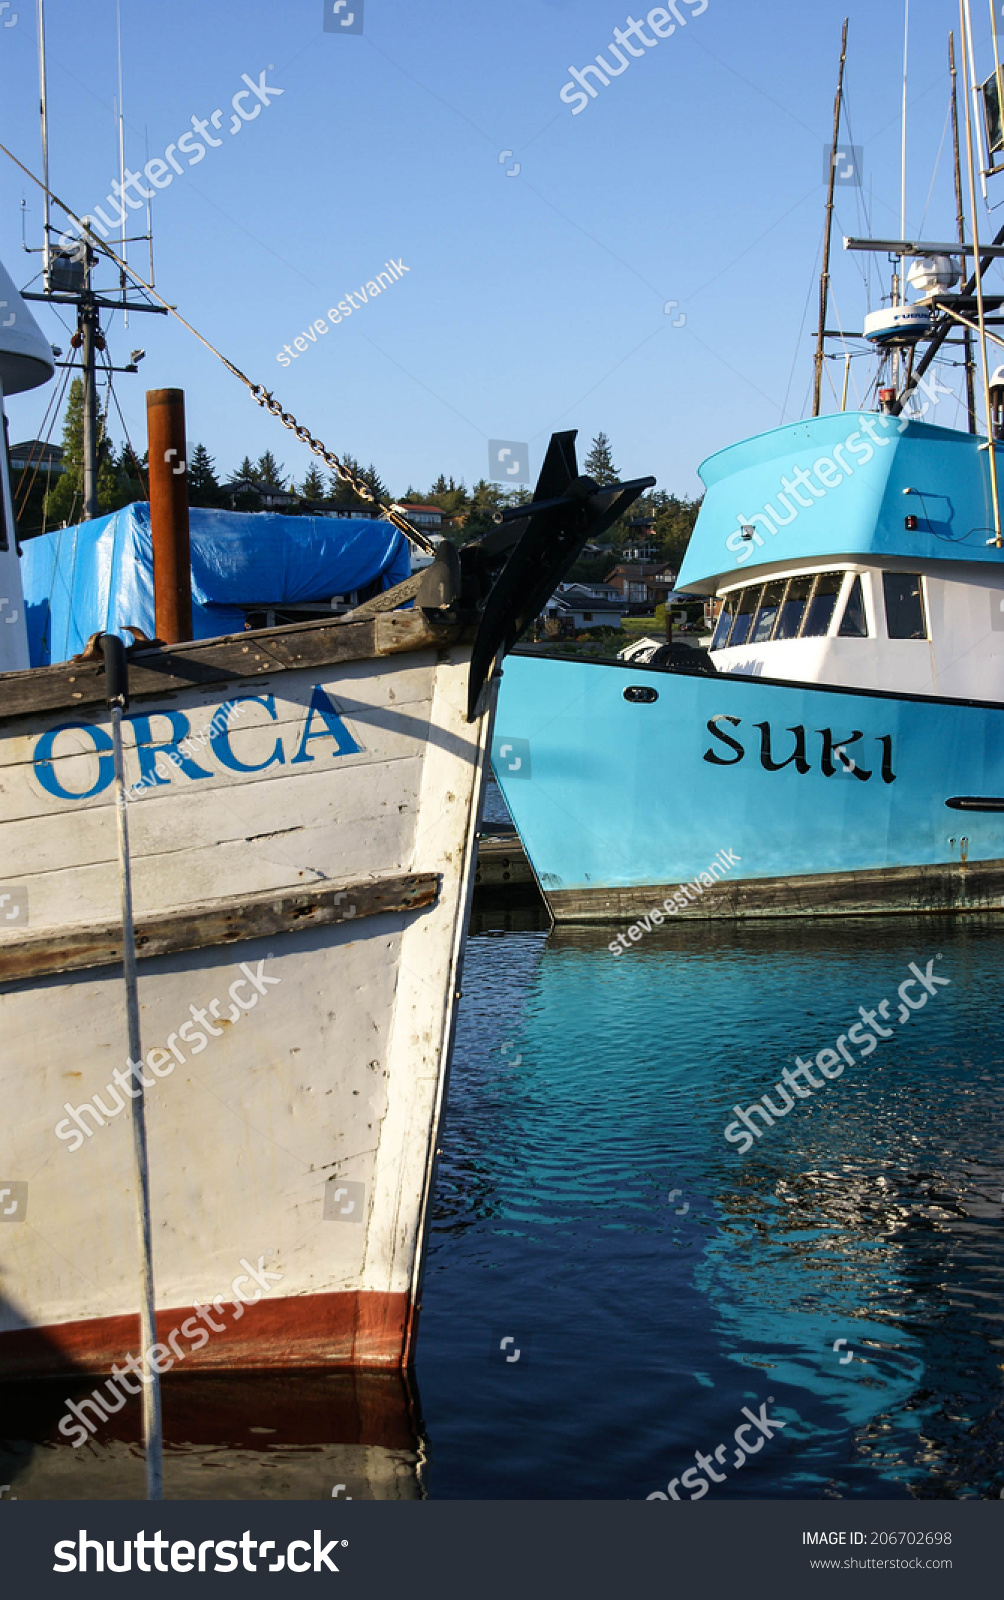 Newport oregon may 8 2009 fishing stock photo 206702698 for Newport oregon fishing